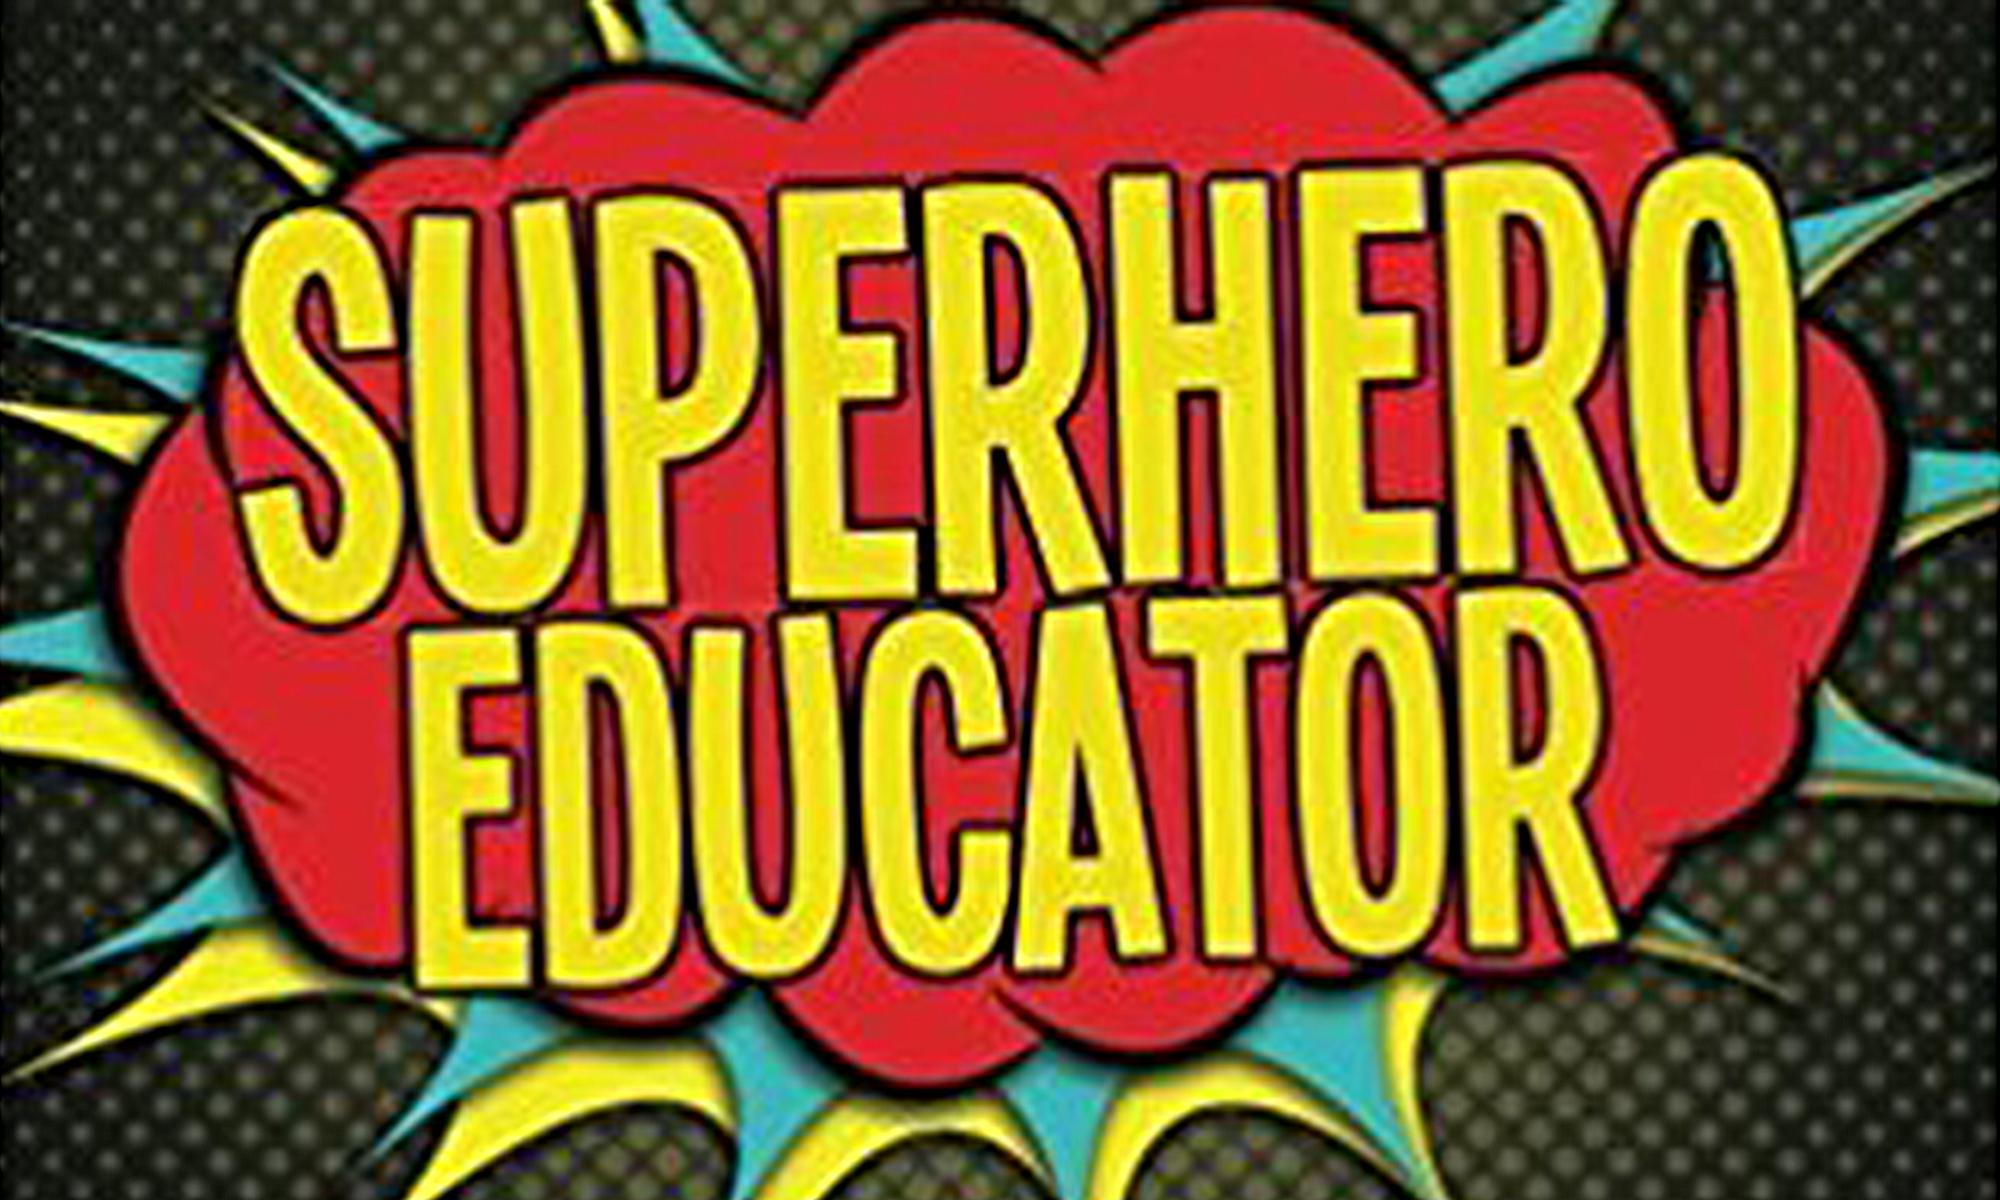 Superhero Educator